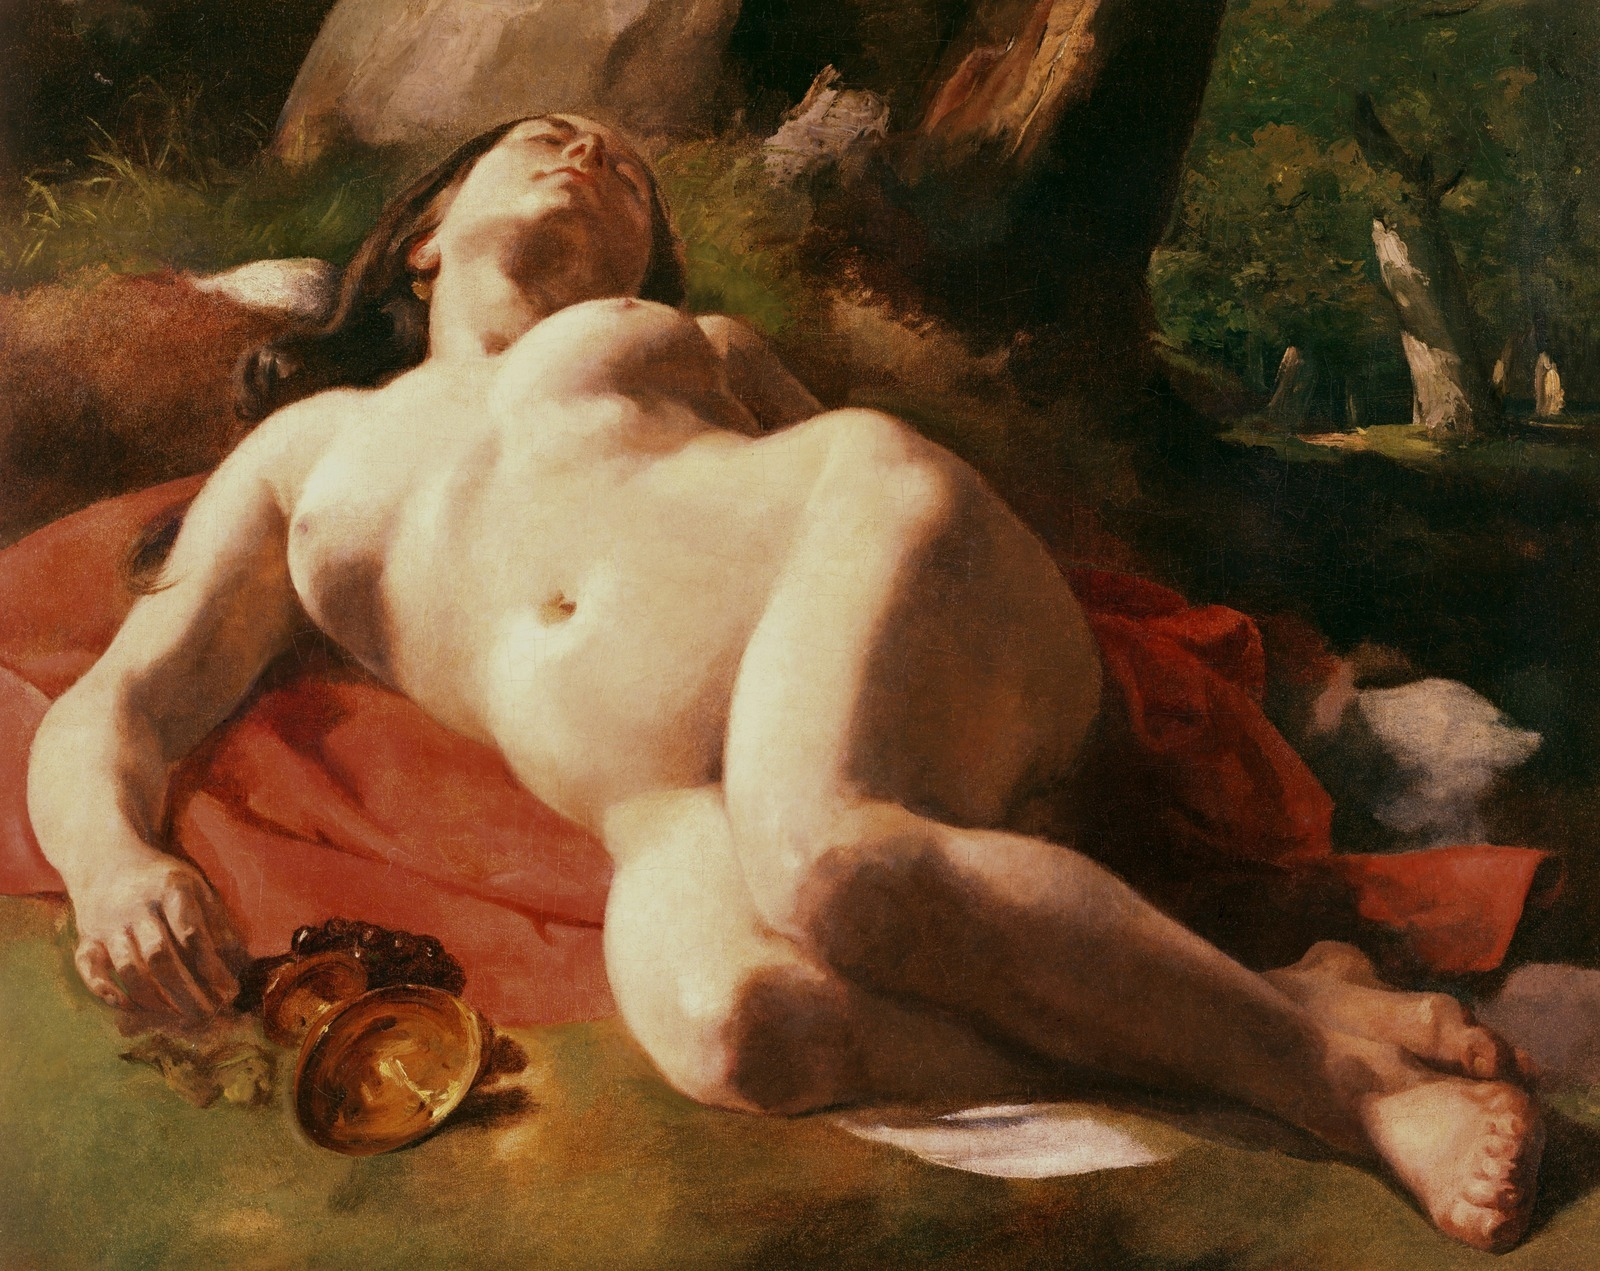 Гюстав Курбе. 1844-1847. Вакханка (La Bacchante). 76.2 x 63.4. Холст, масло. Частное собрание.